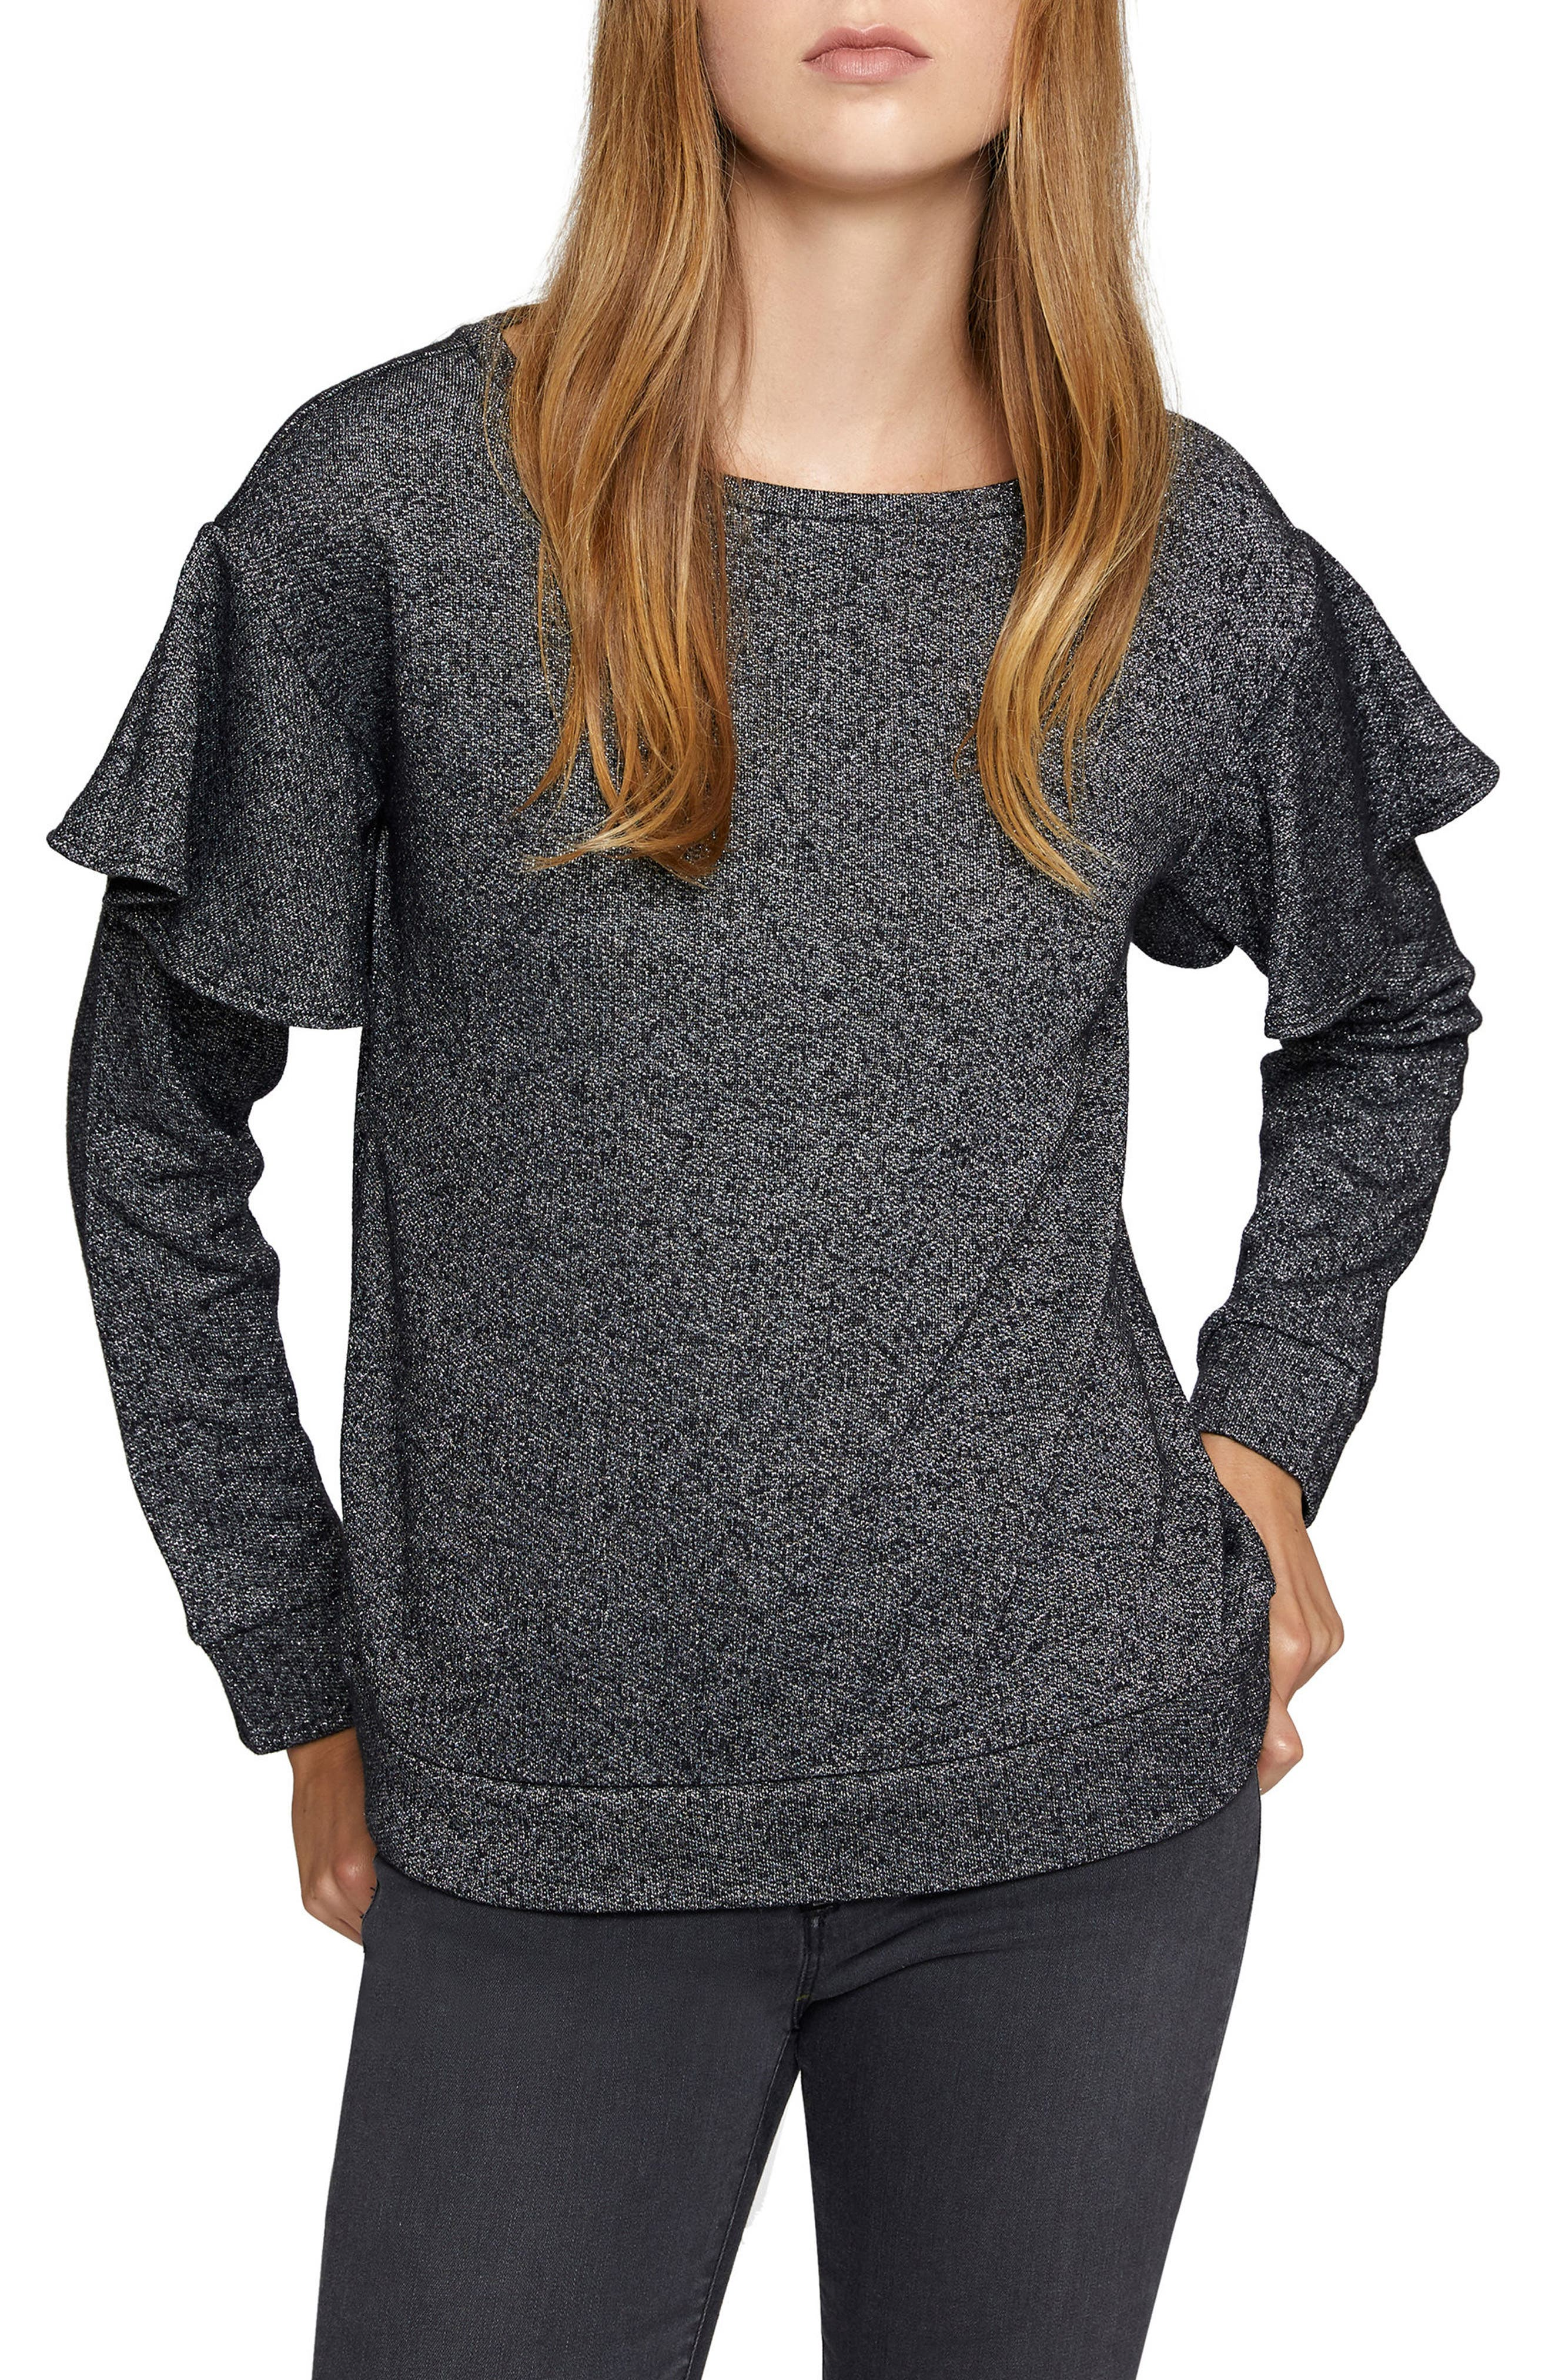 Dominique Metallic Sweatshirt,                             Main thumbnail 1, color,                             Black